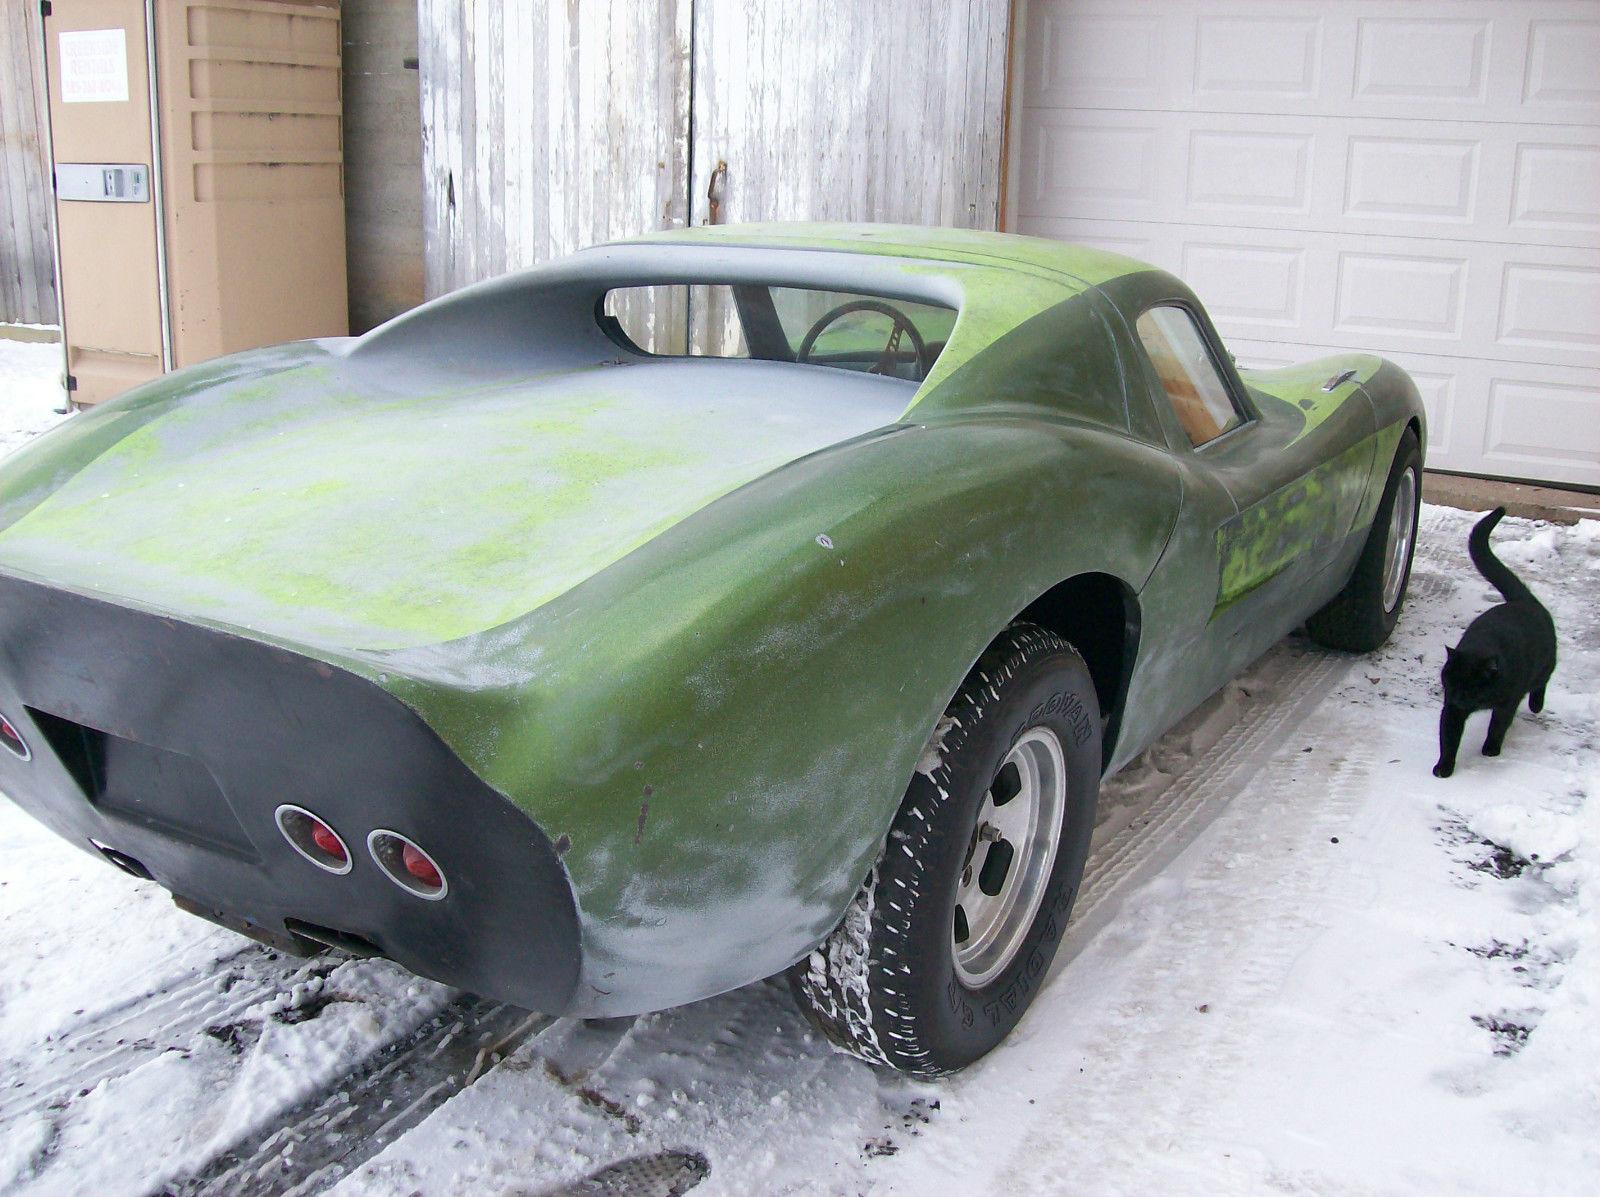 fiberfab  aztec gt kit car vw  rare  ferrari dino gt  avenger classic replica